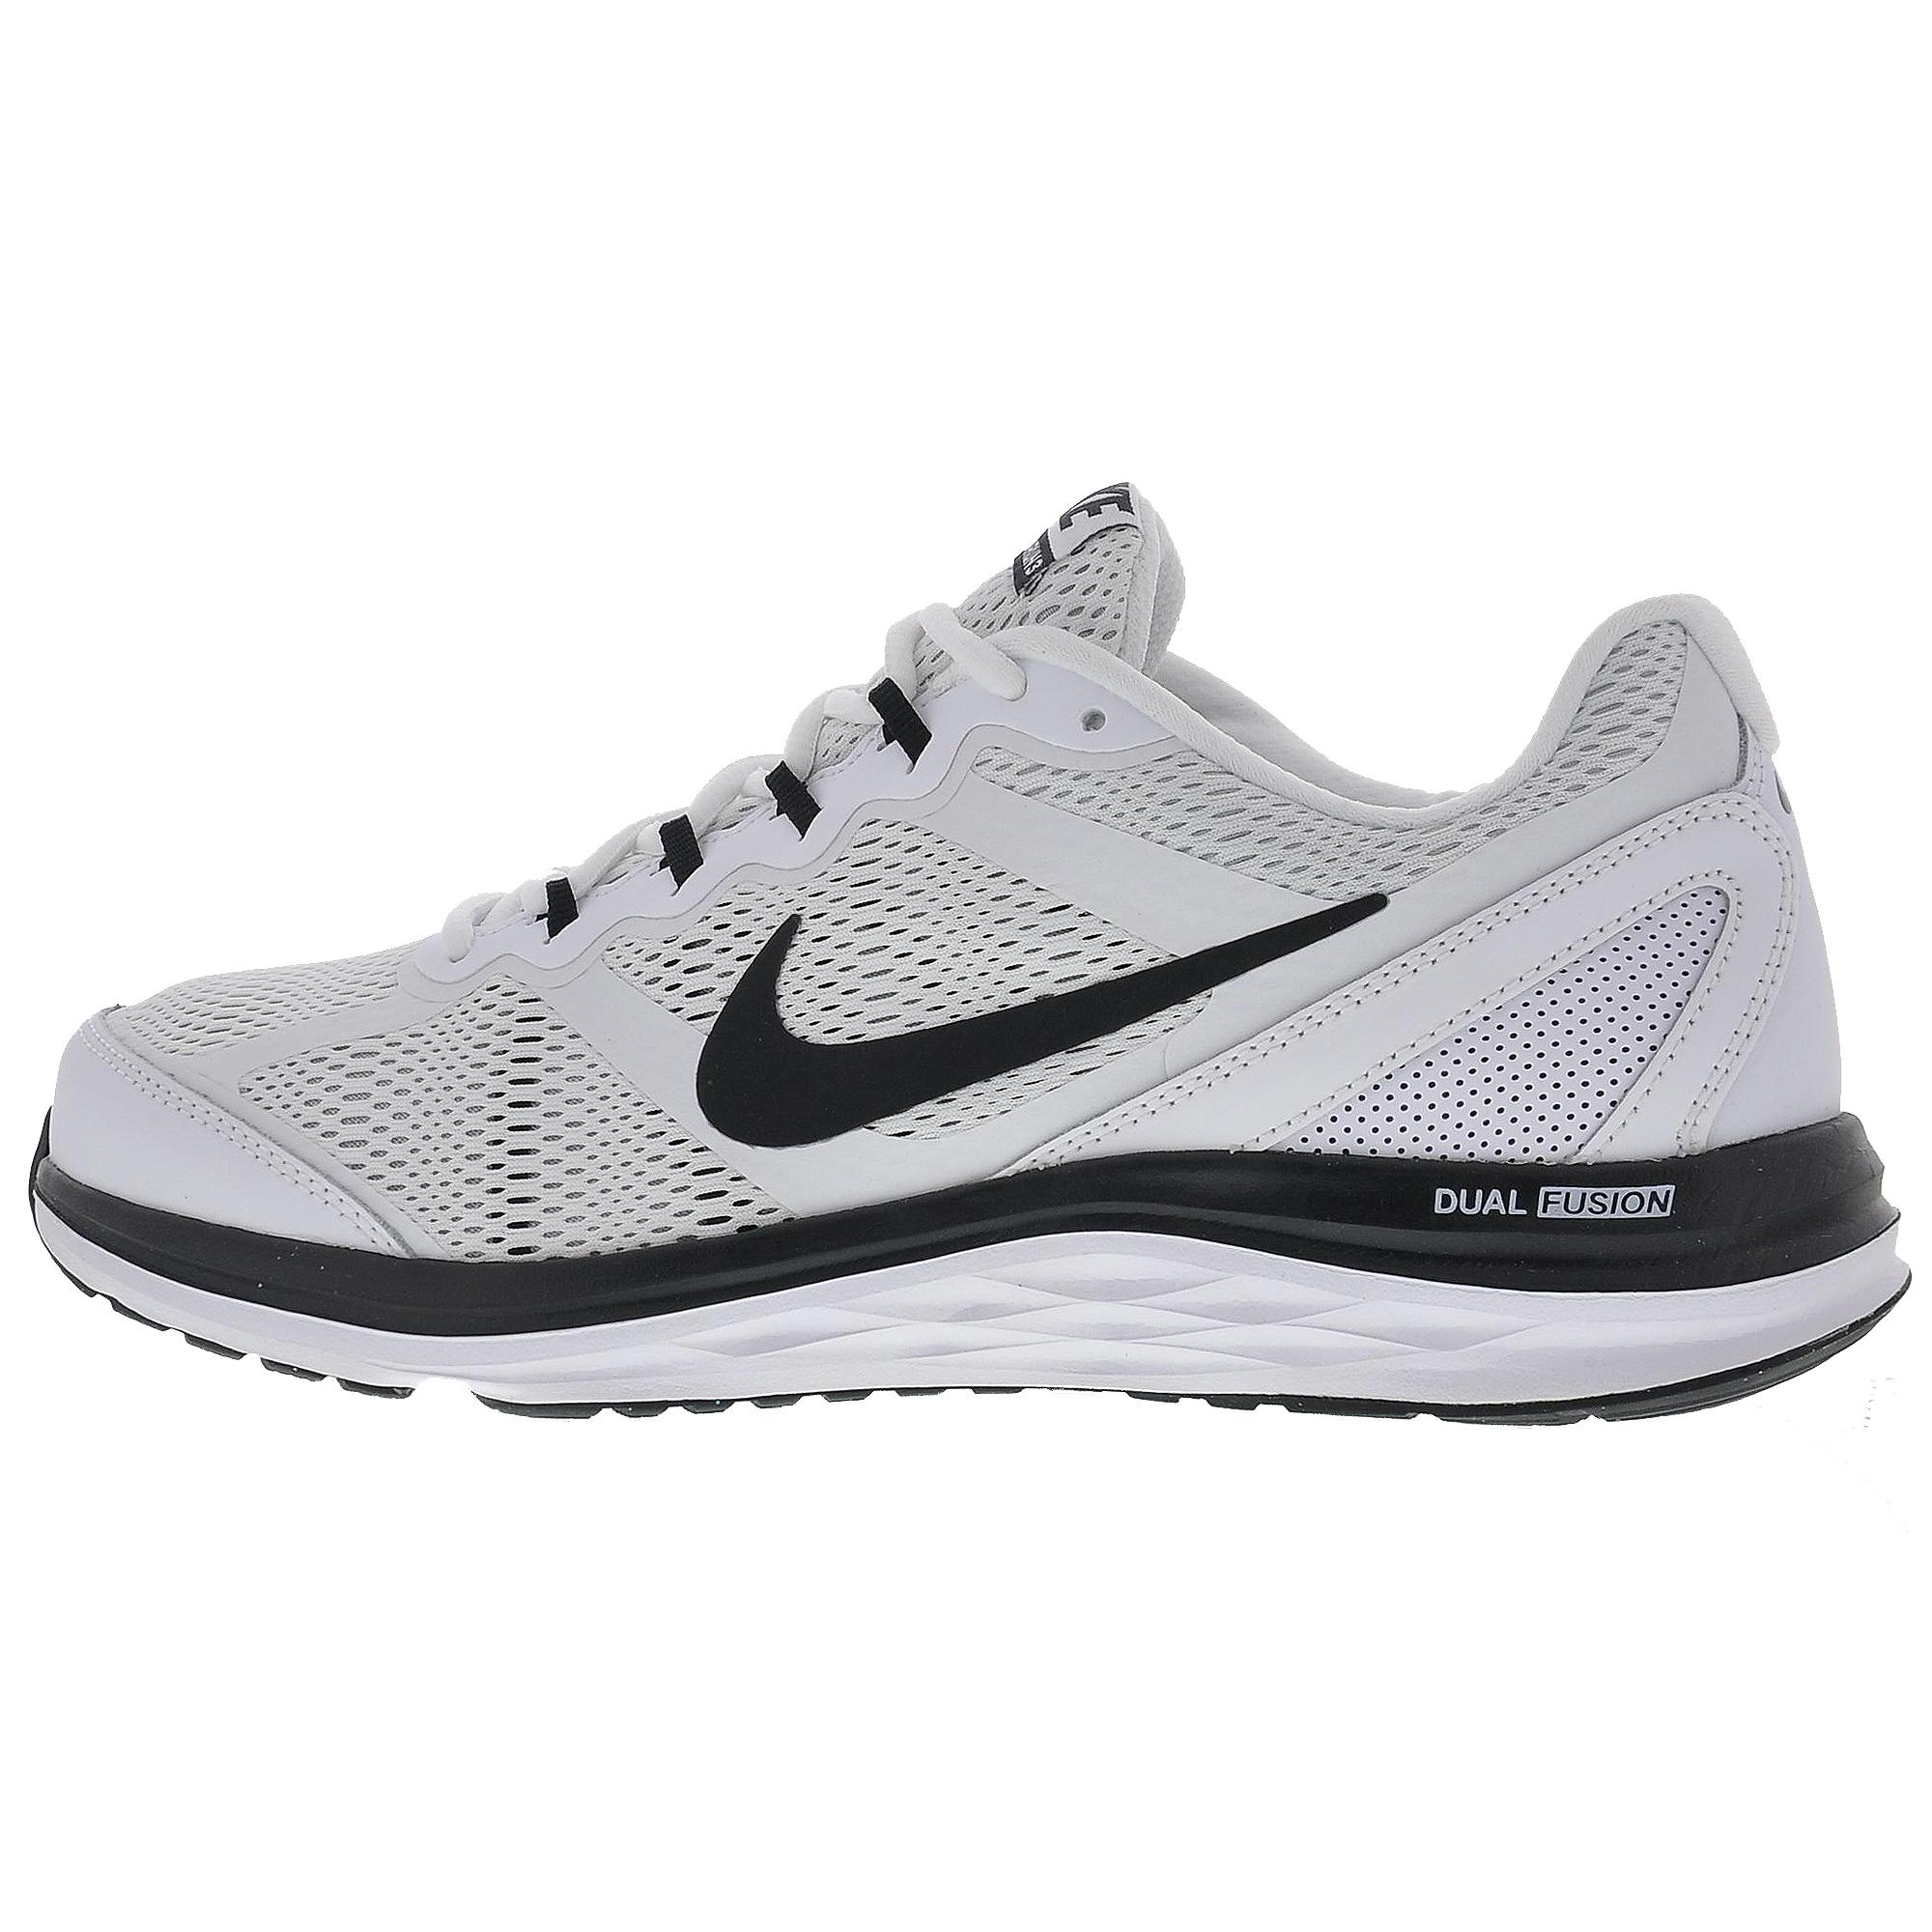 énorme réduction 39ce5 1633d Nike Dual Fusion Run 3 Spor Ayakkabı